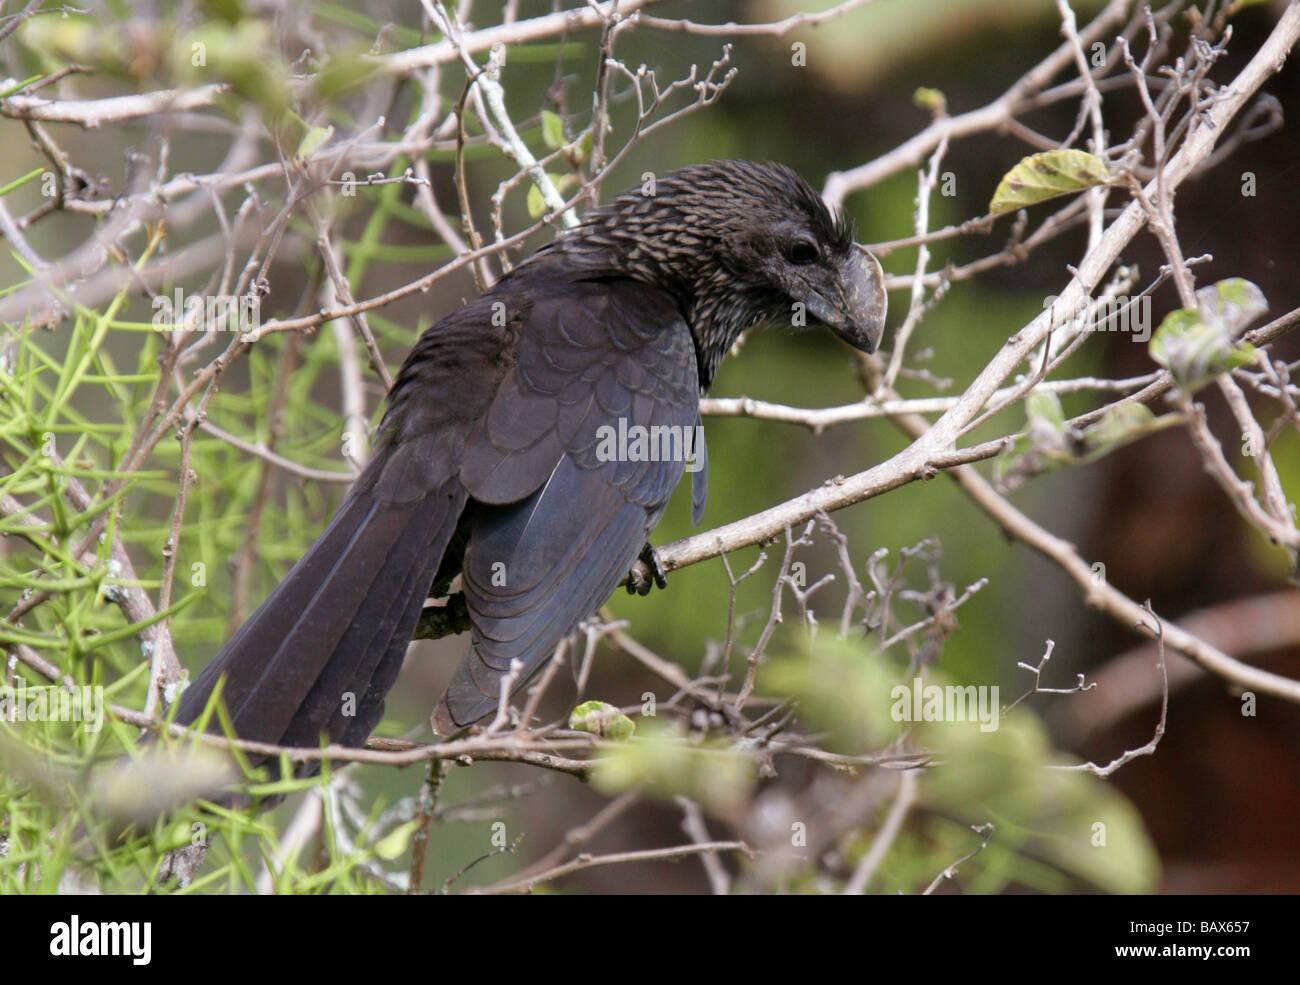 Smooth-billed Ani Bird, Crotophaga ani, Cuculidae, Santa Cruz Island (Indefatigable) Galapagos Islands, Ecuador, - Stock Image